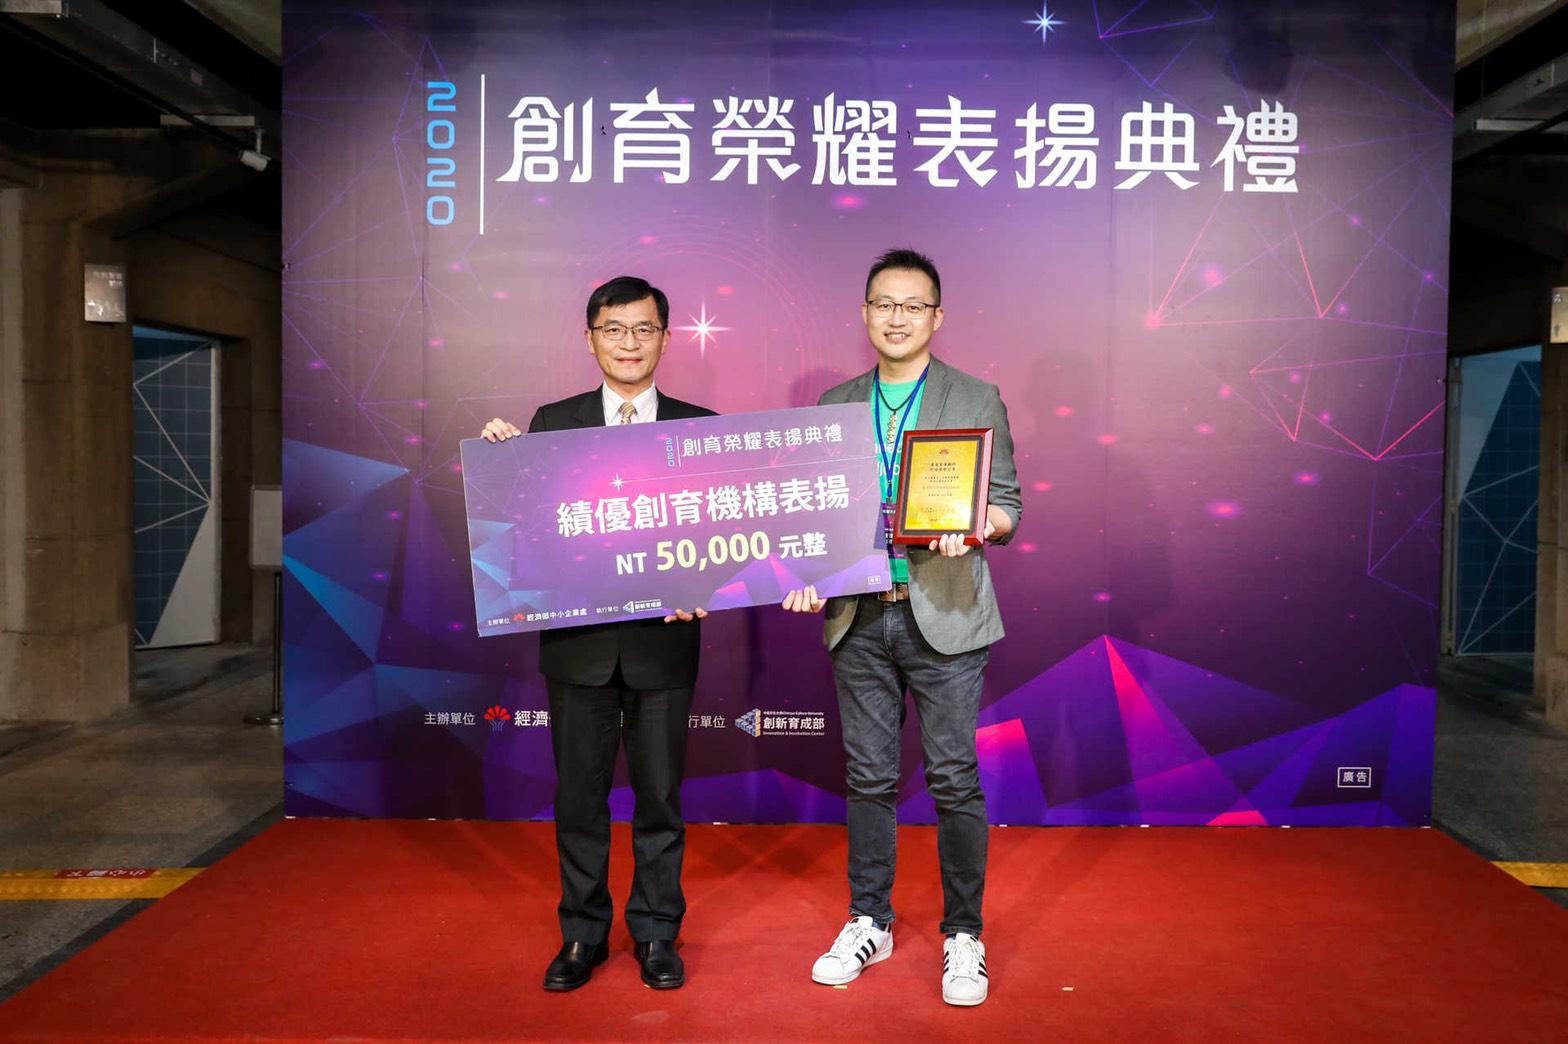 Starfab榮獲經濟部中小企業處109年度績優創育機構-國際創育加速器!